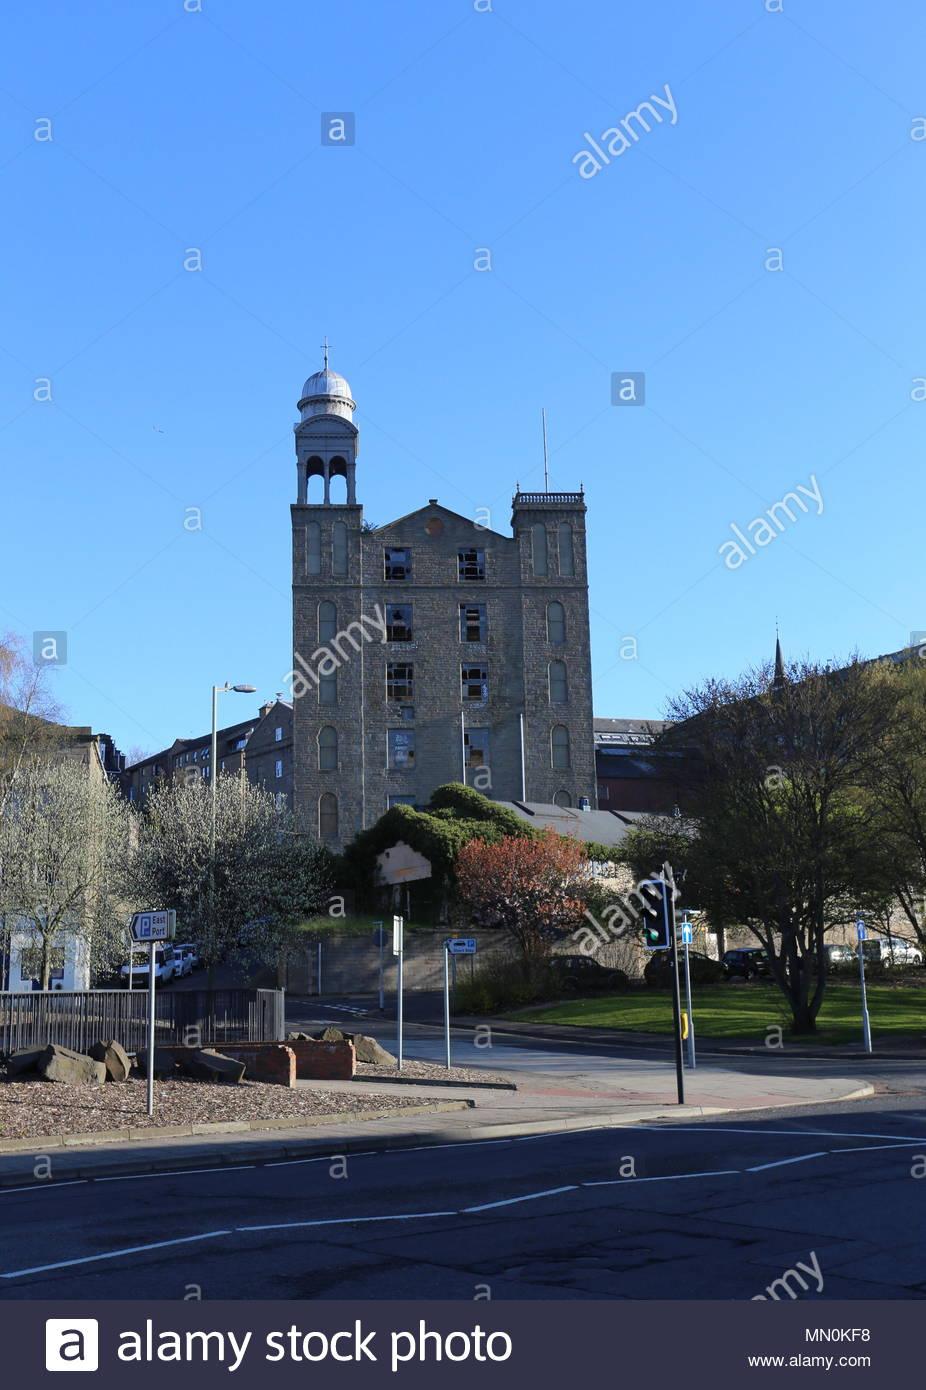 Former Baxter Brothers Mills Dundee Scotland  April 2016 Stock Photo